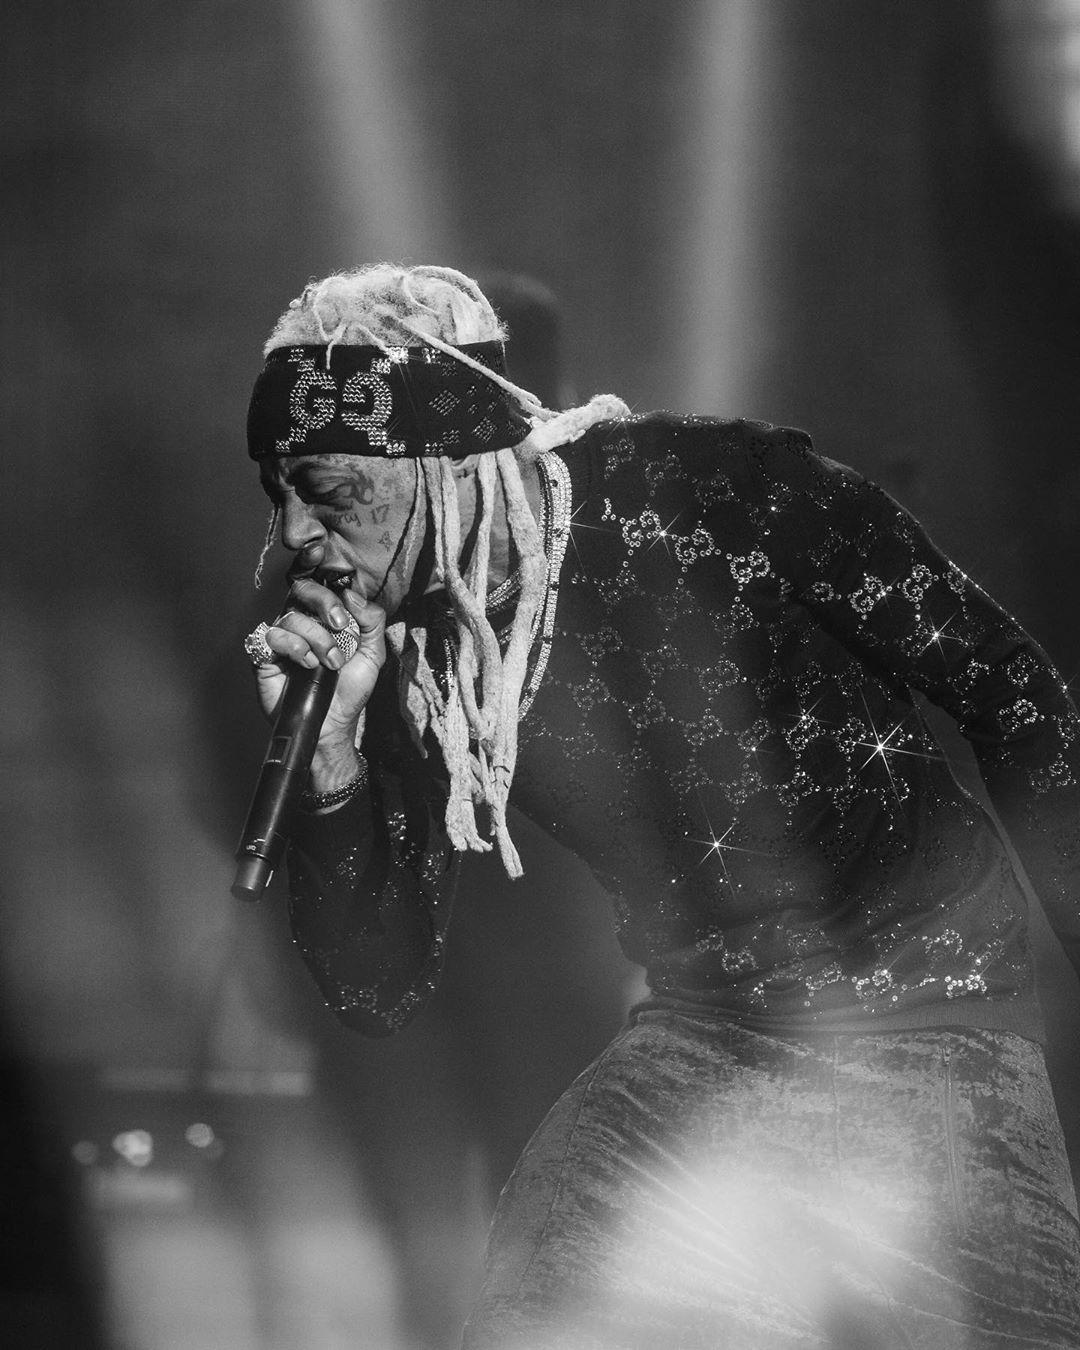 Lil Wayne at Broccoli City Festival